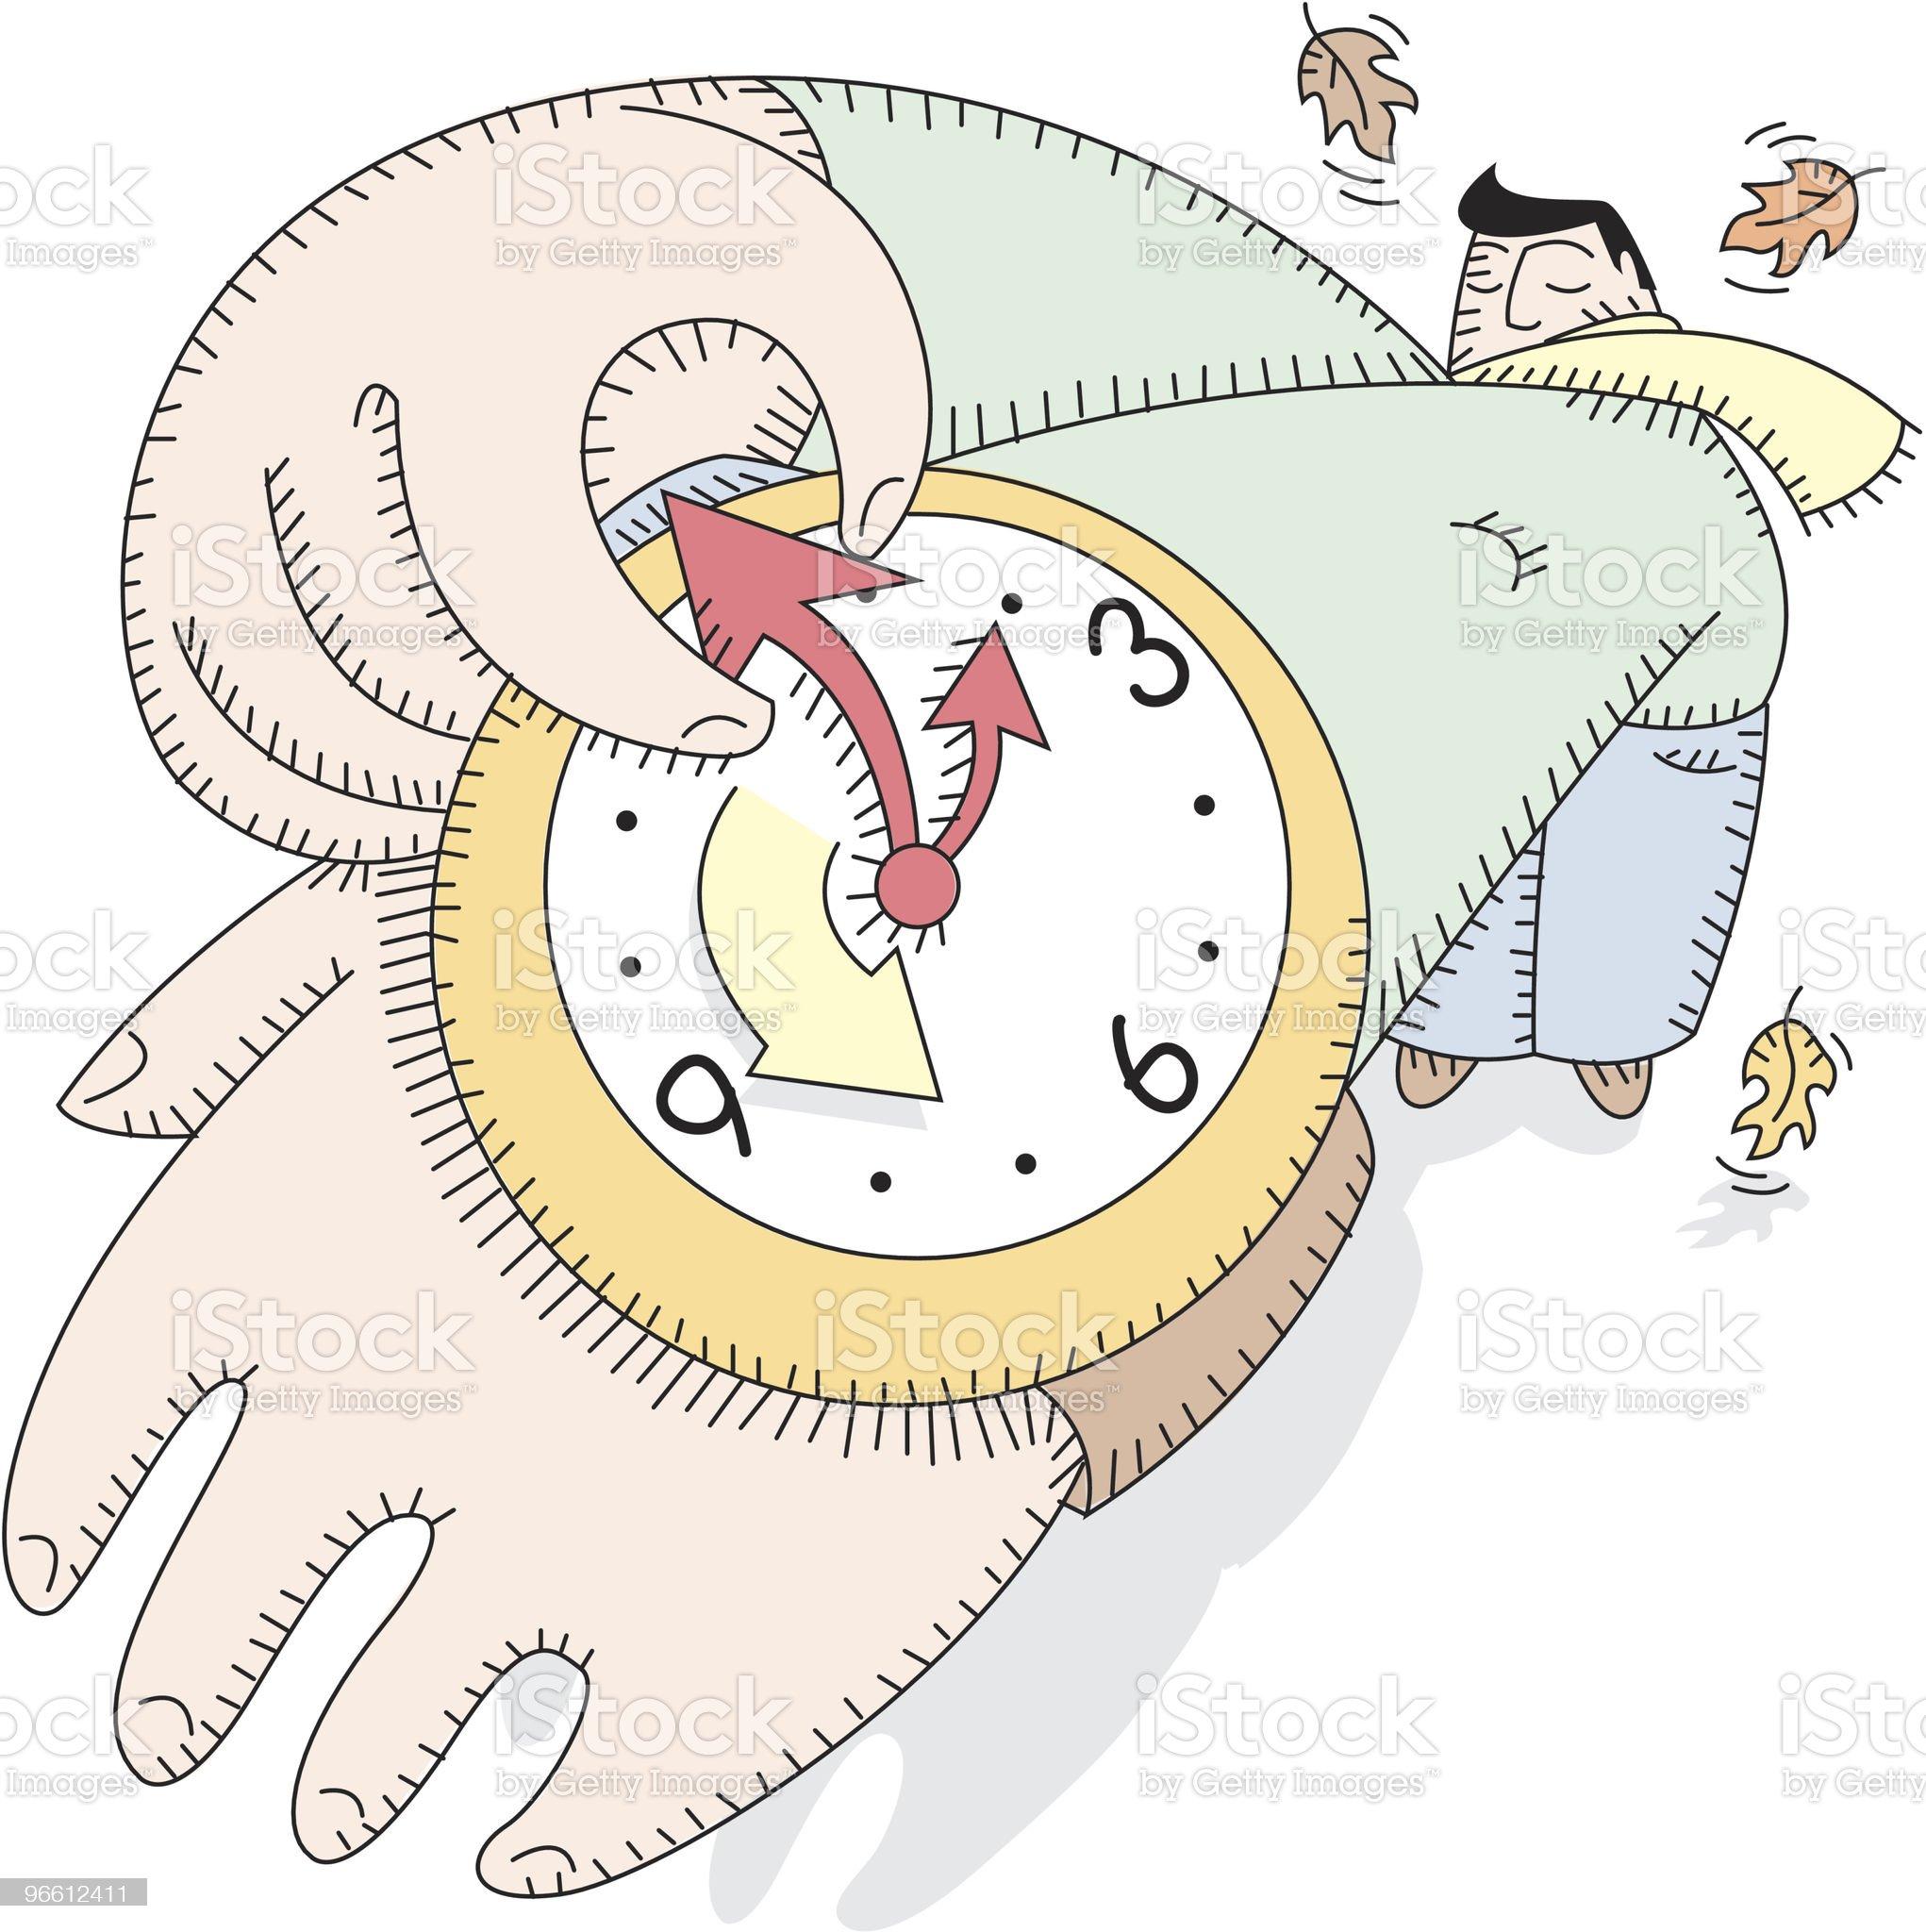 Daylight savings time, man sets watch royalty-free stock vector art